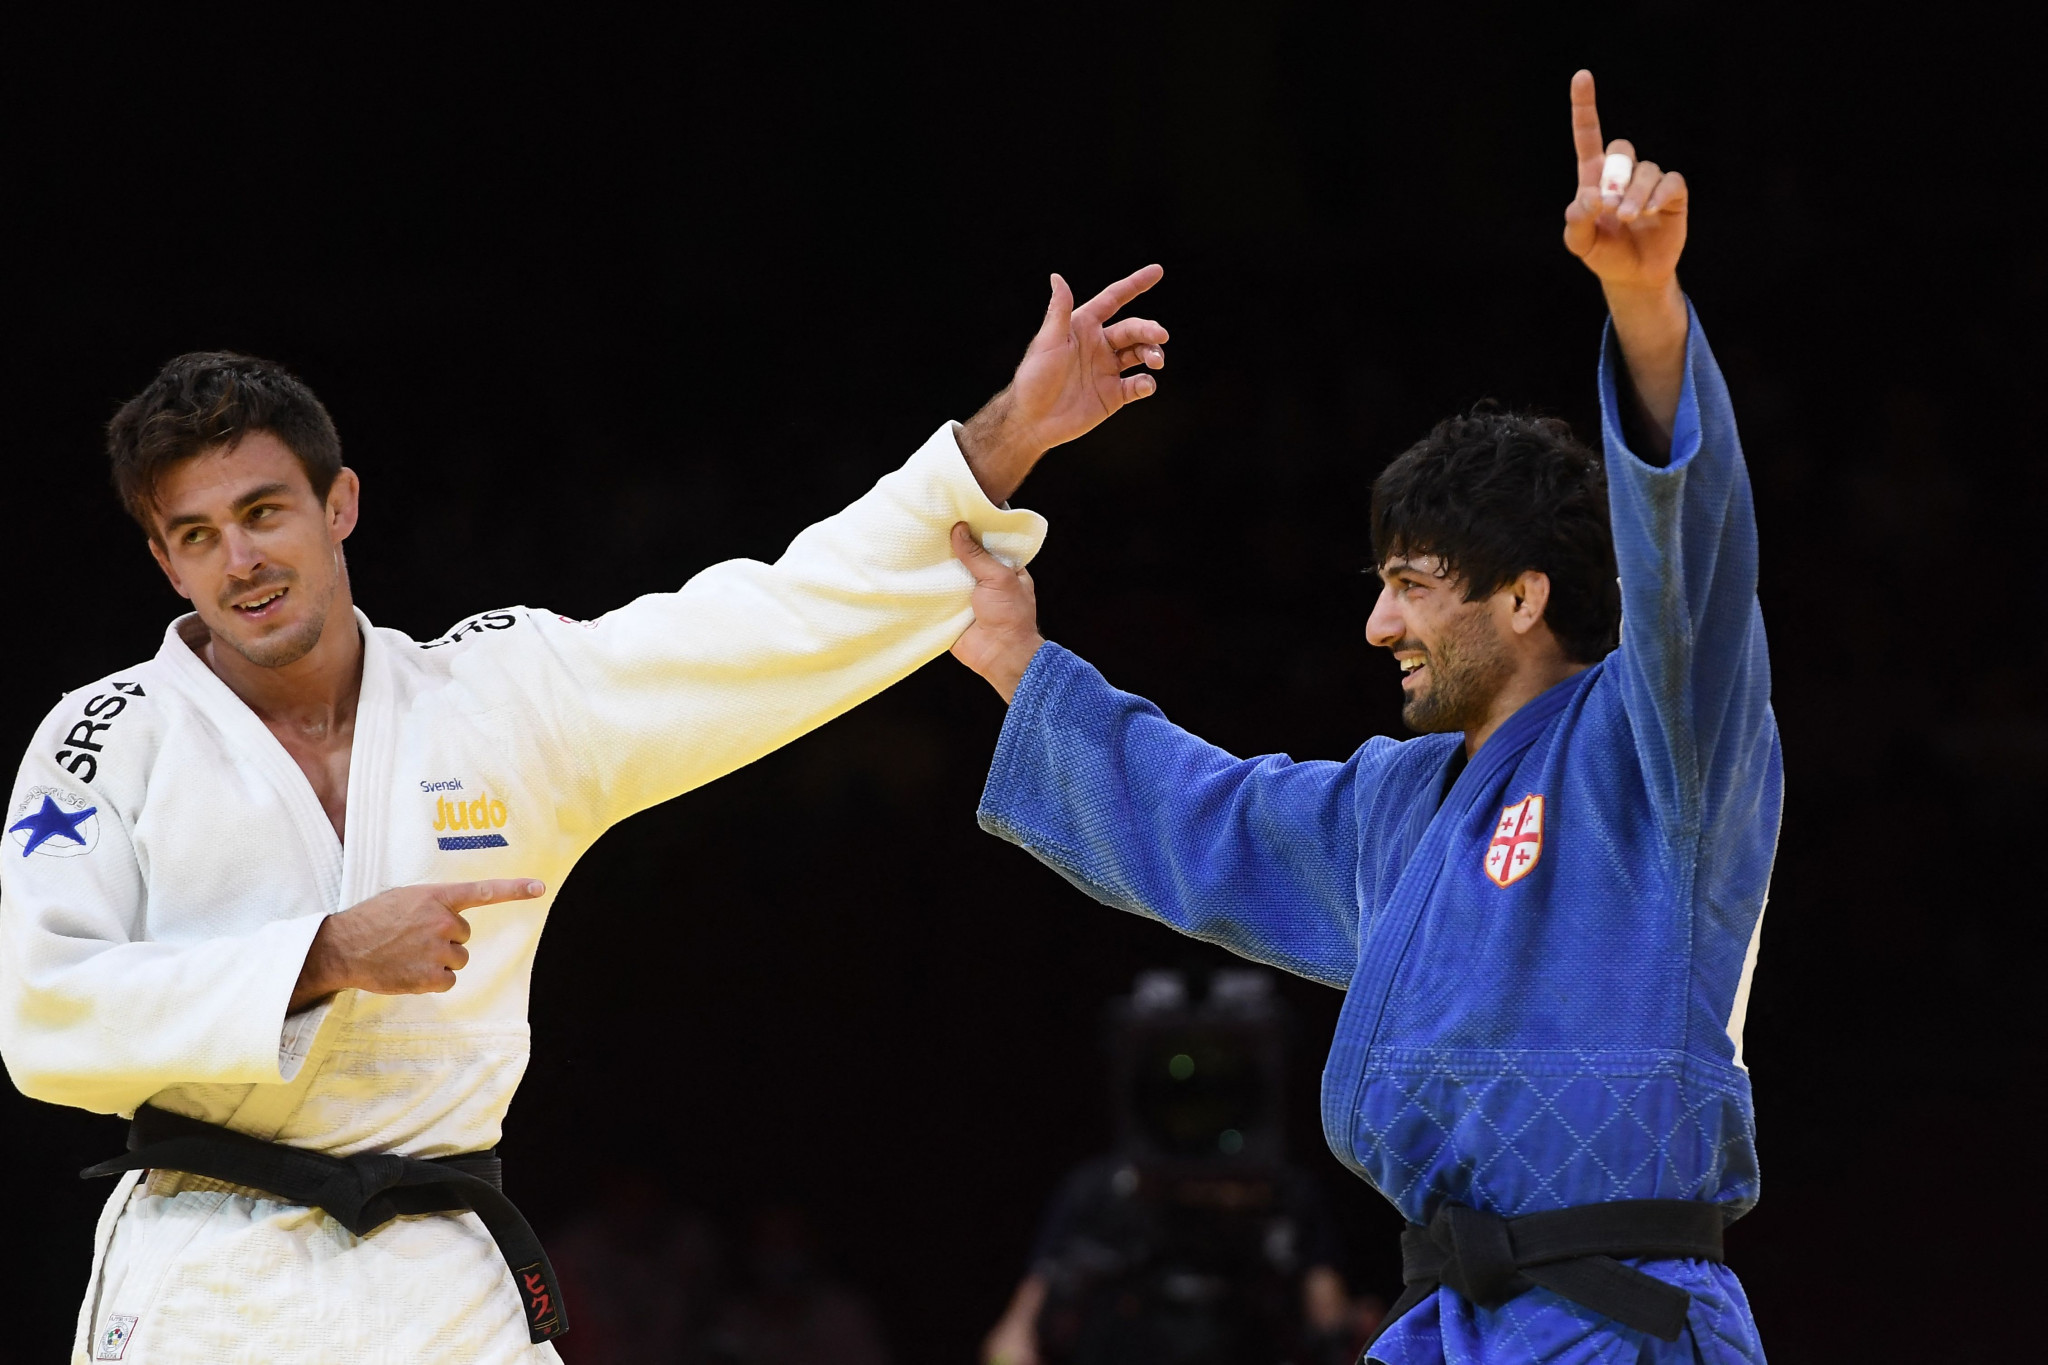 Tommy Macias shows plenty of respect to Lasha Shavdatuashvili who claimed the men's under-73kg title ©Getty Images